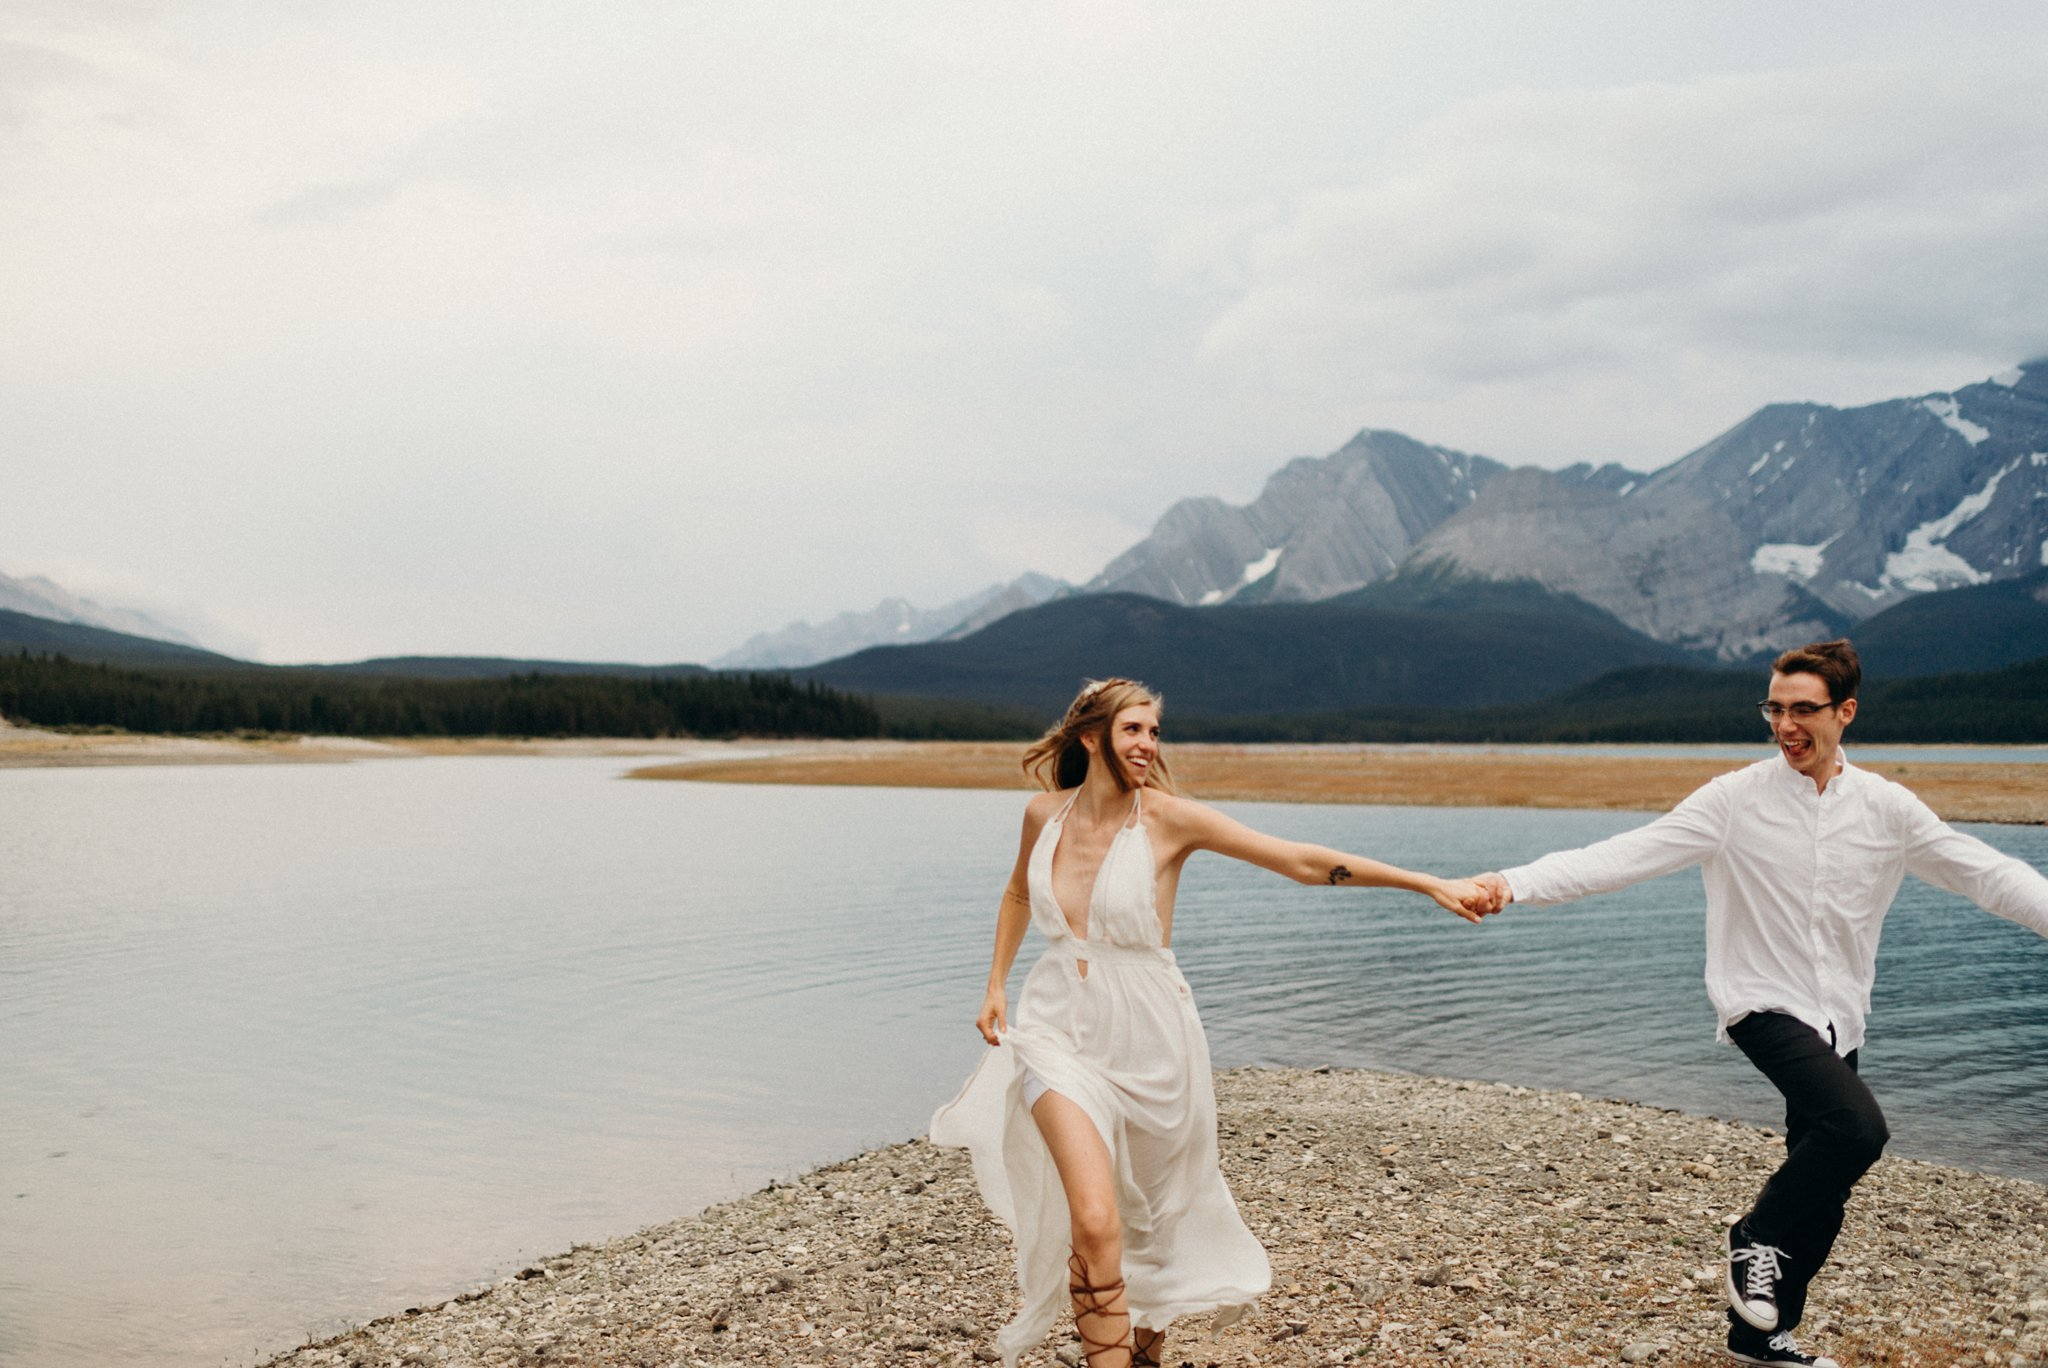 kaihla_tonai_intimate_wedding_elopement_photographer_6441.jpg